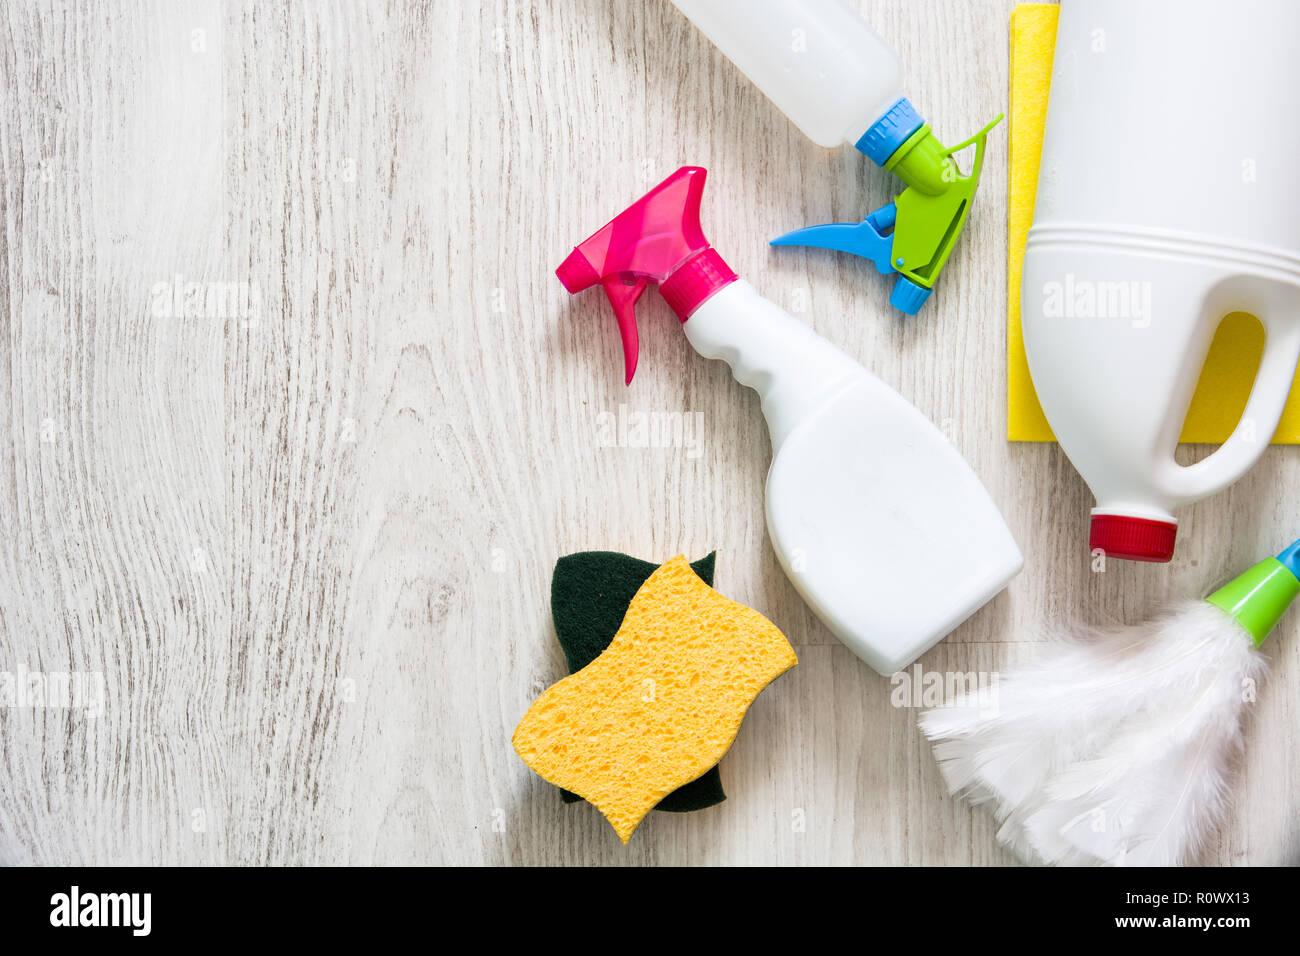 Antiseptic Disinfectant Stock Photos Amp Antiseptic